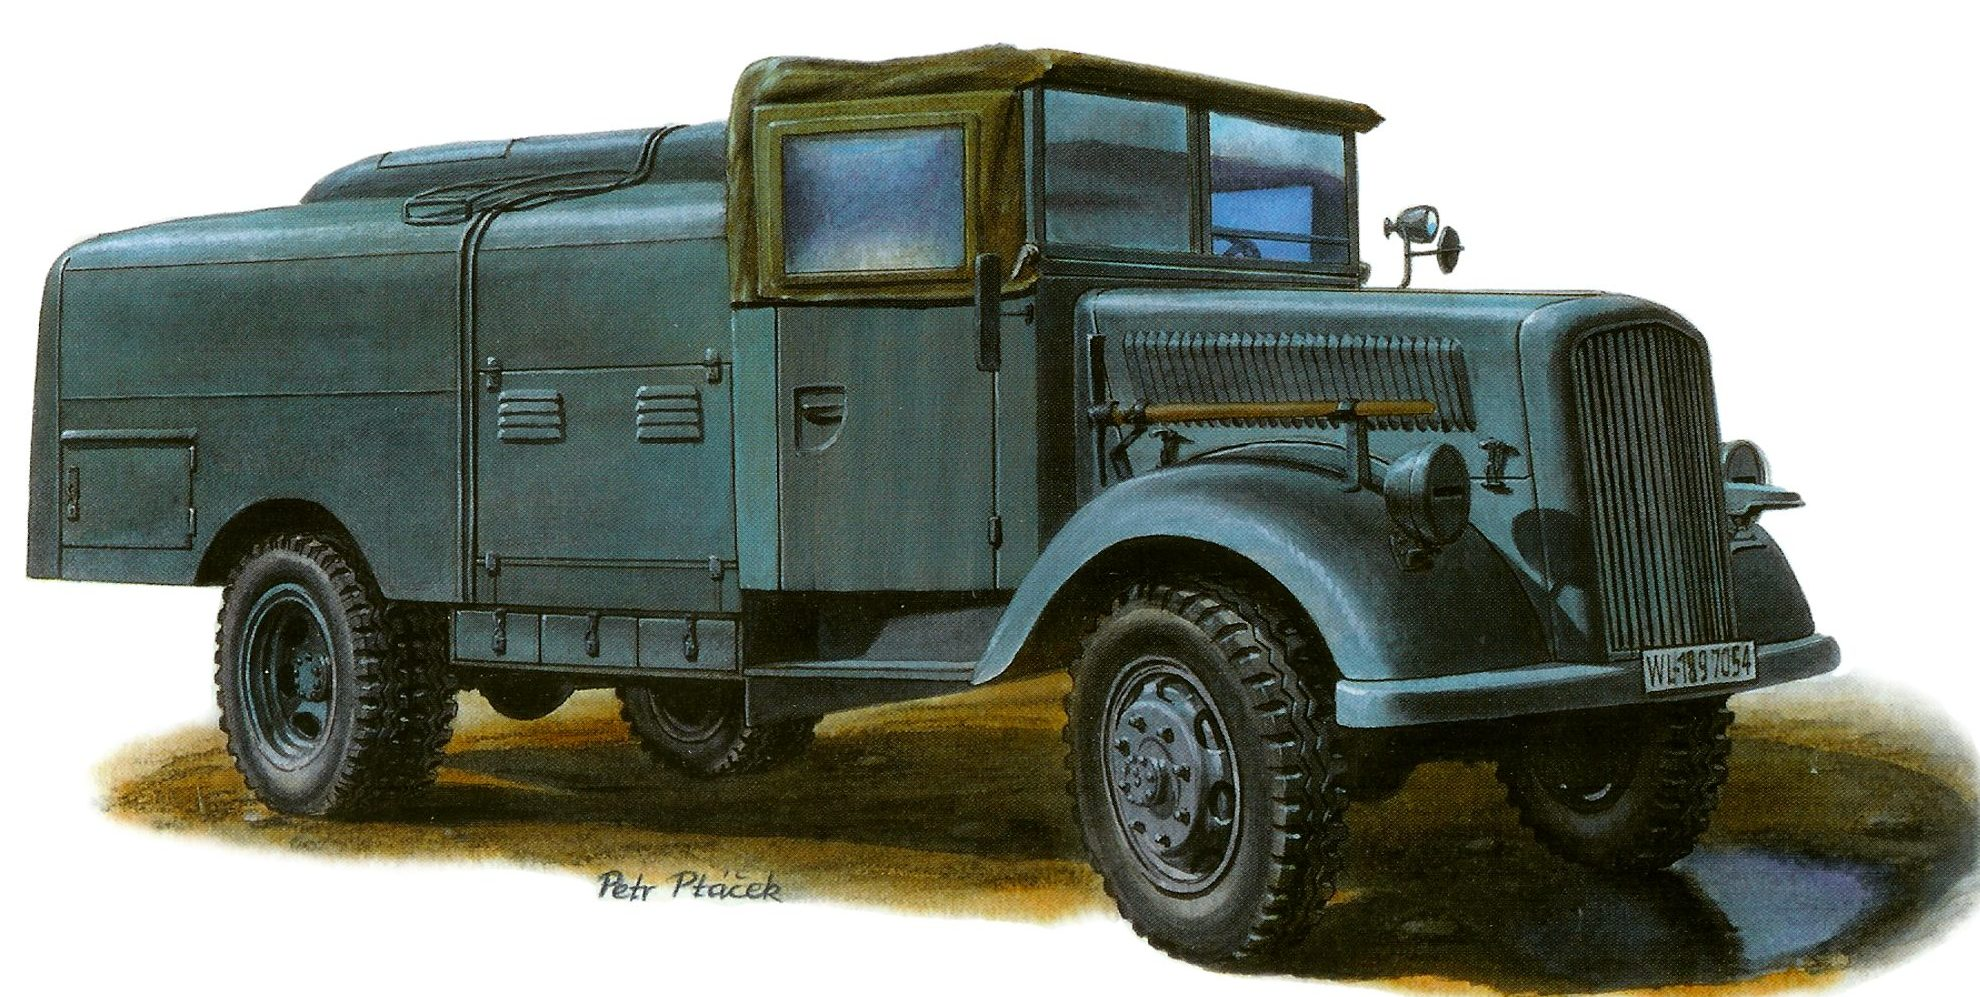 Ptácek Petr. Заправщик ракетного топлива Opel Blitz T Stoffwagen.